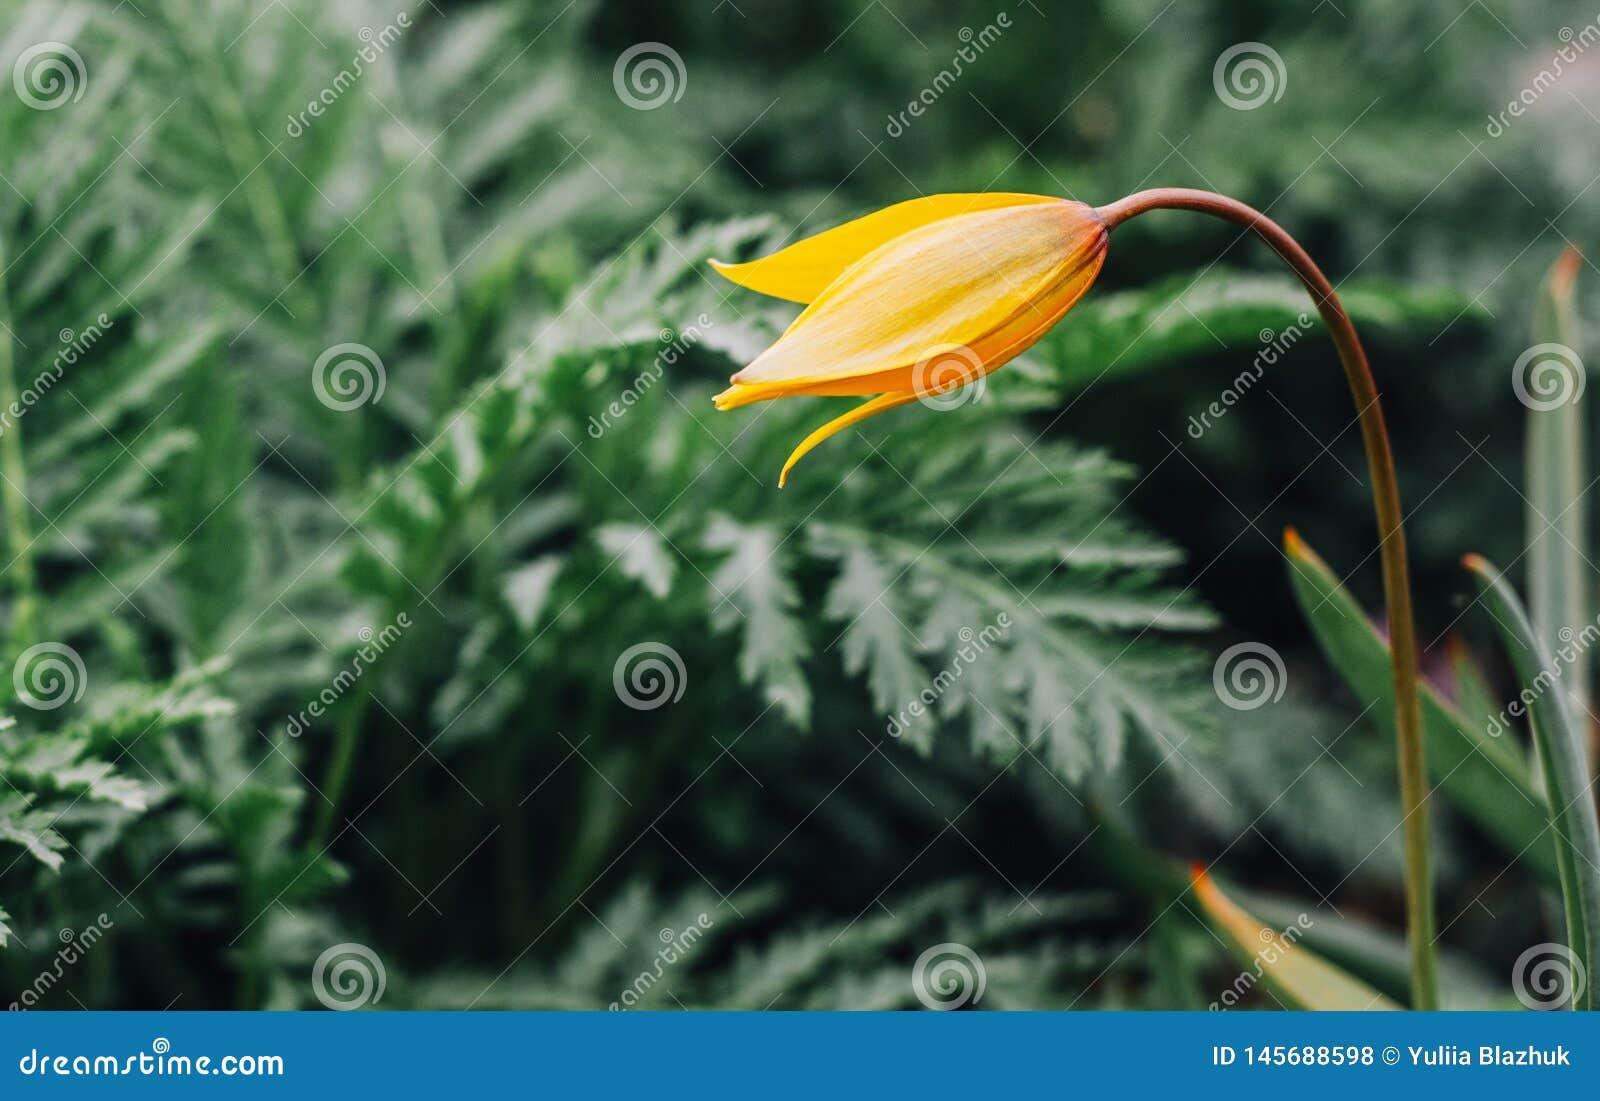 Één gele wilde tulp tegen levendige groene achtergrond